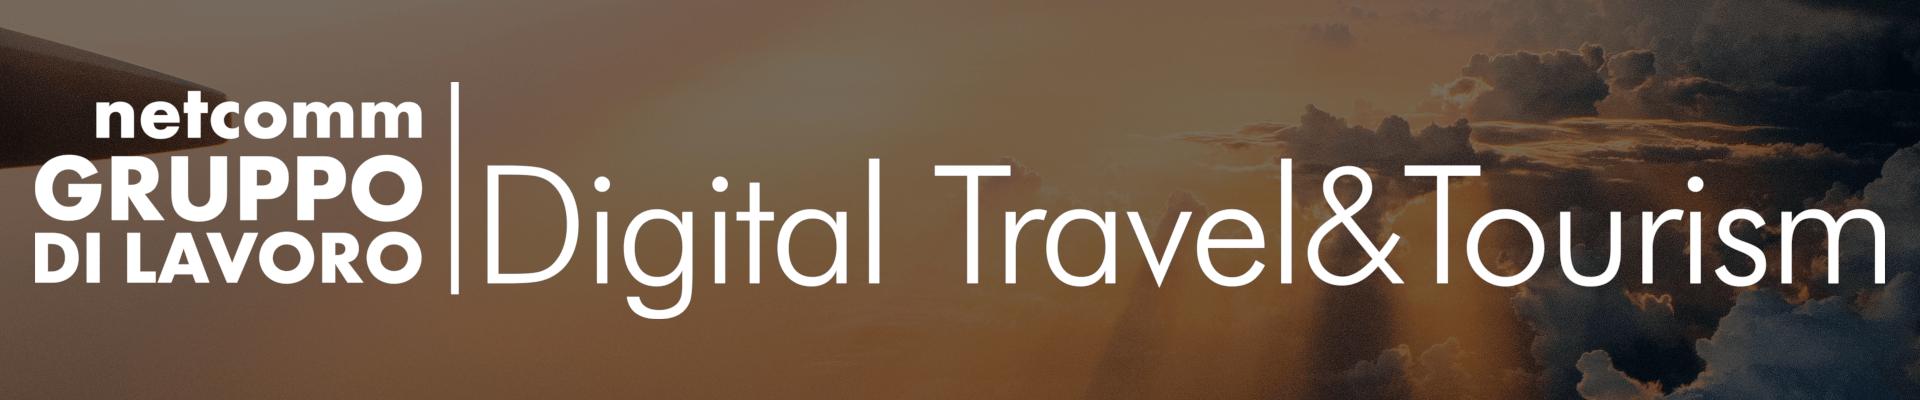 Netcomm Gruppo di Lavoro Digital Travel & Tourism